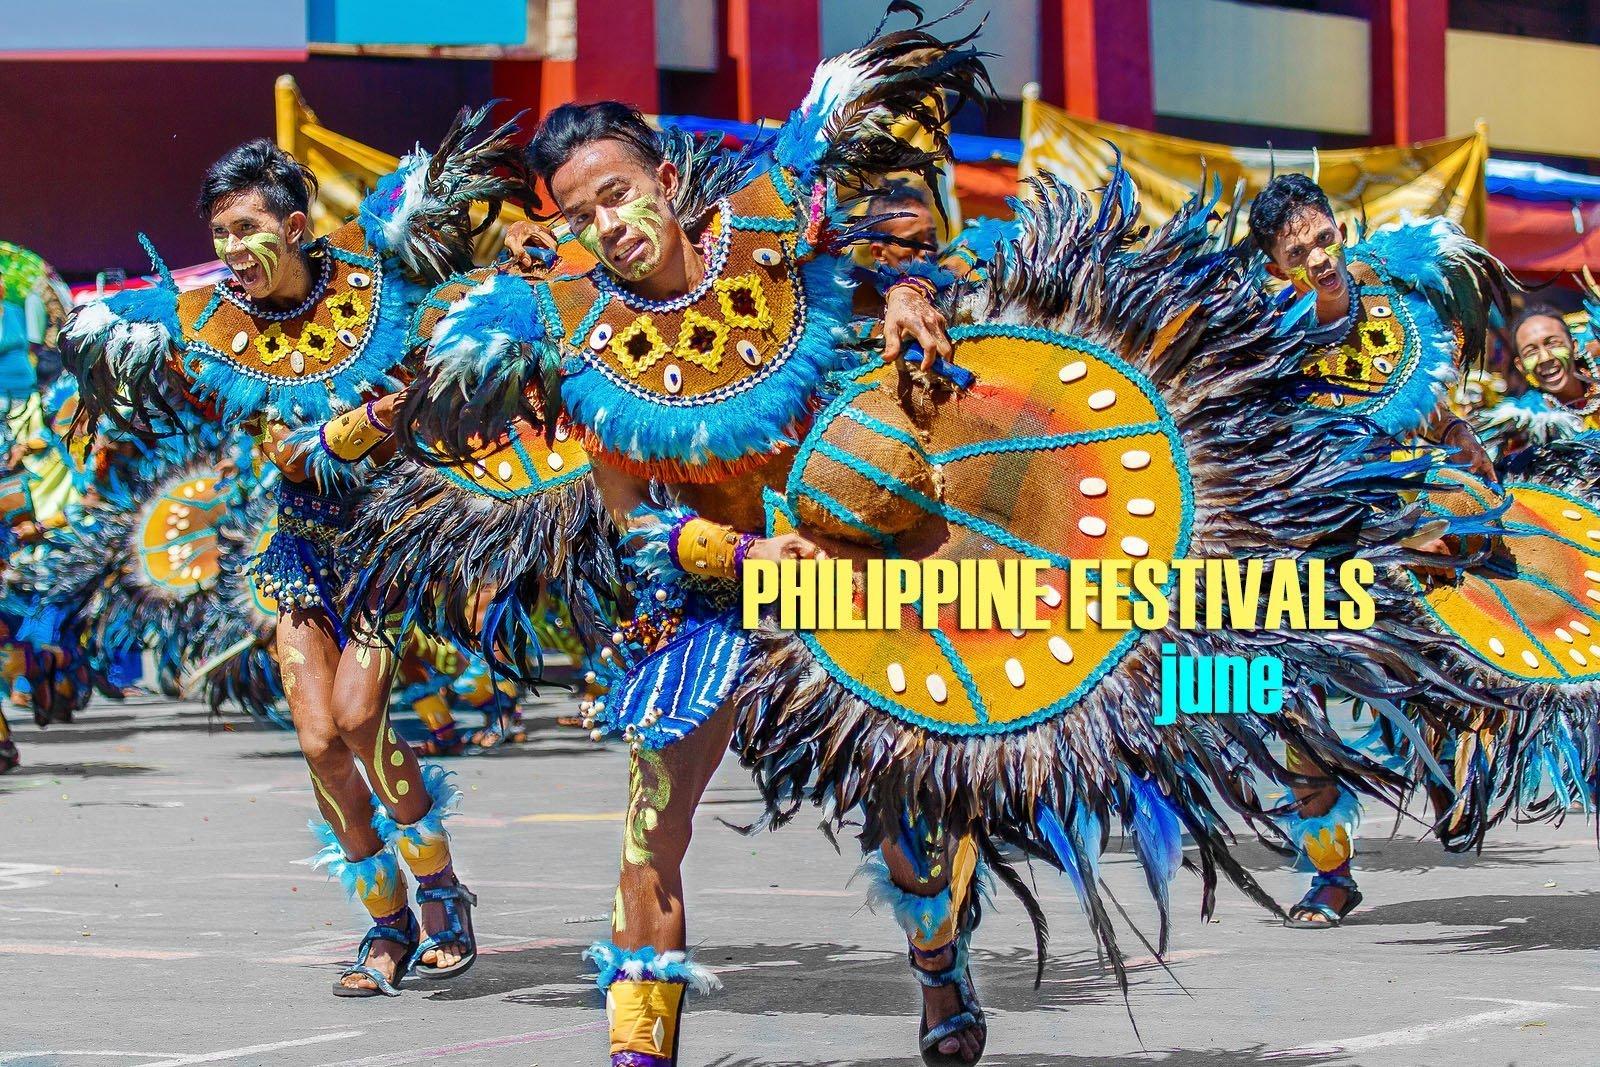 List of Philippine Festivals in June